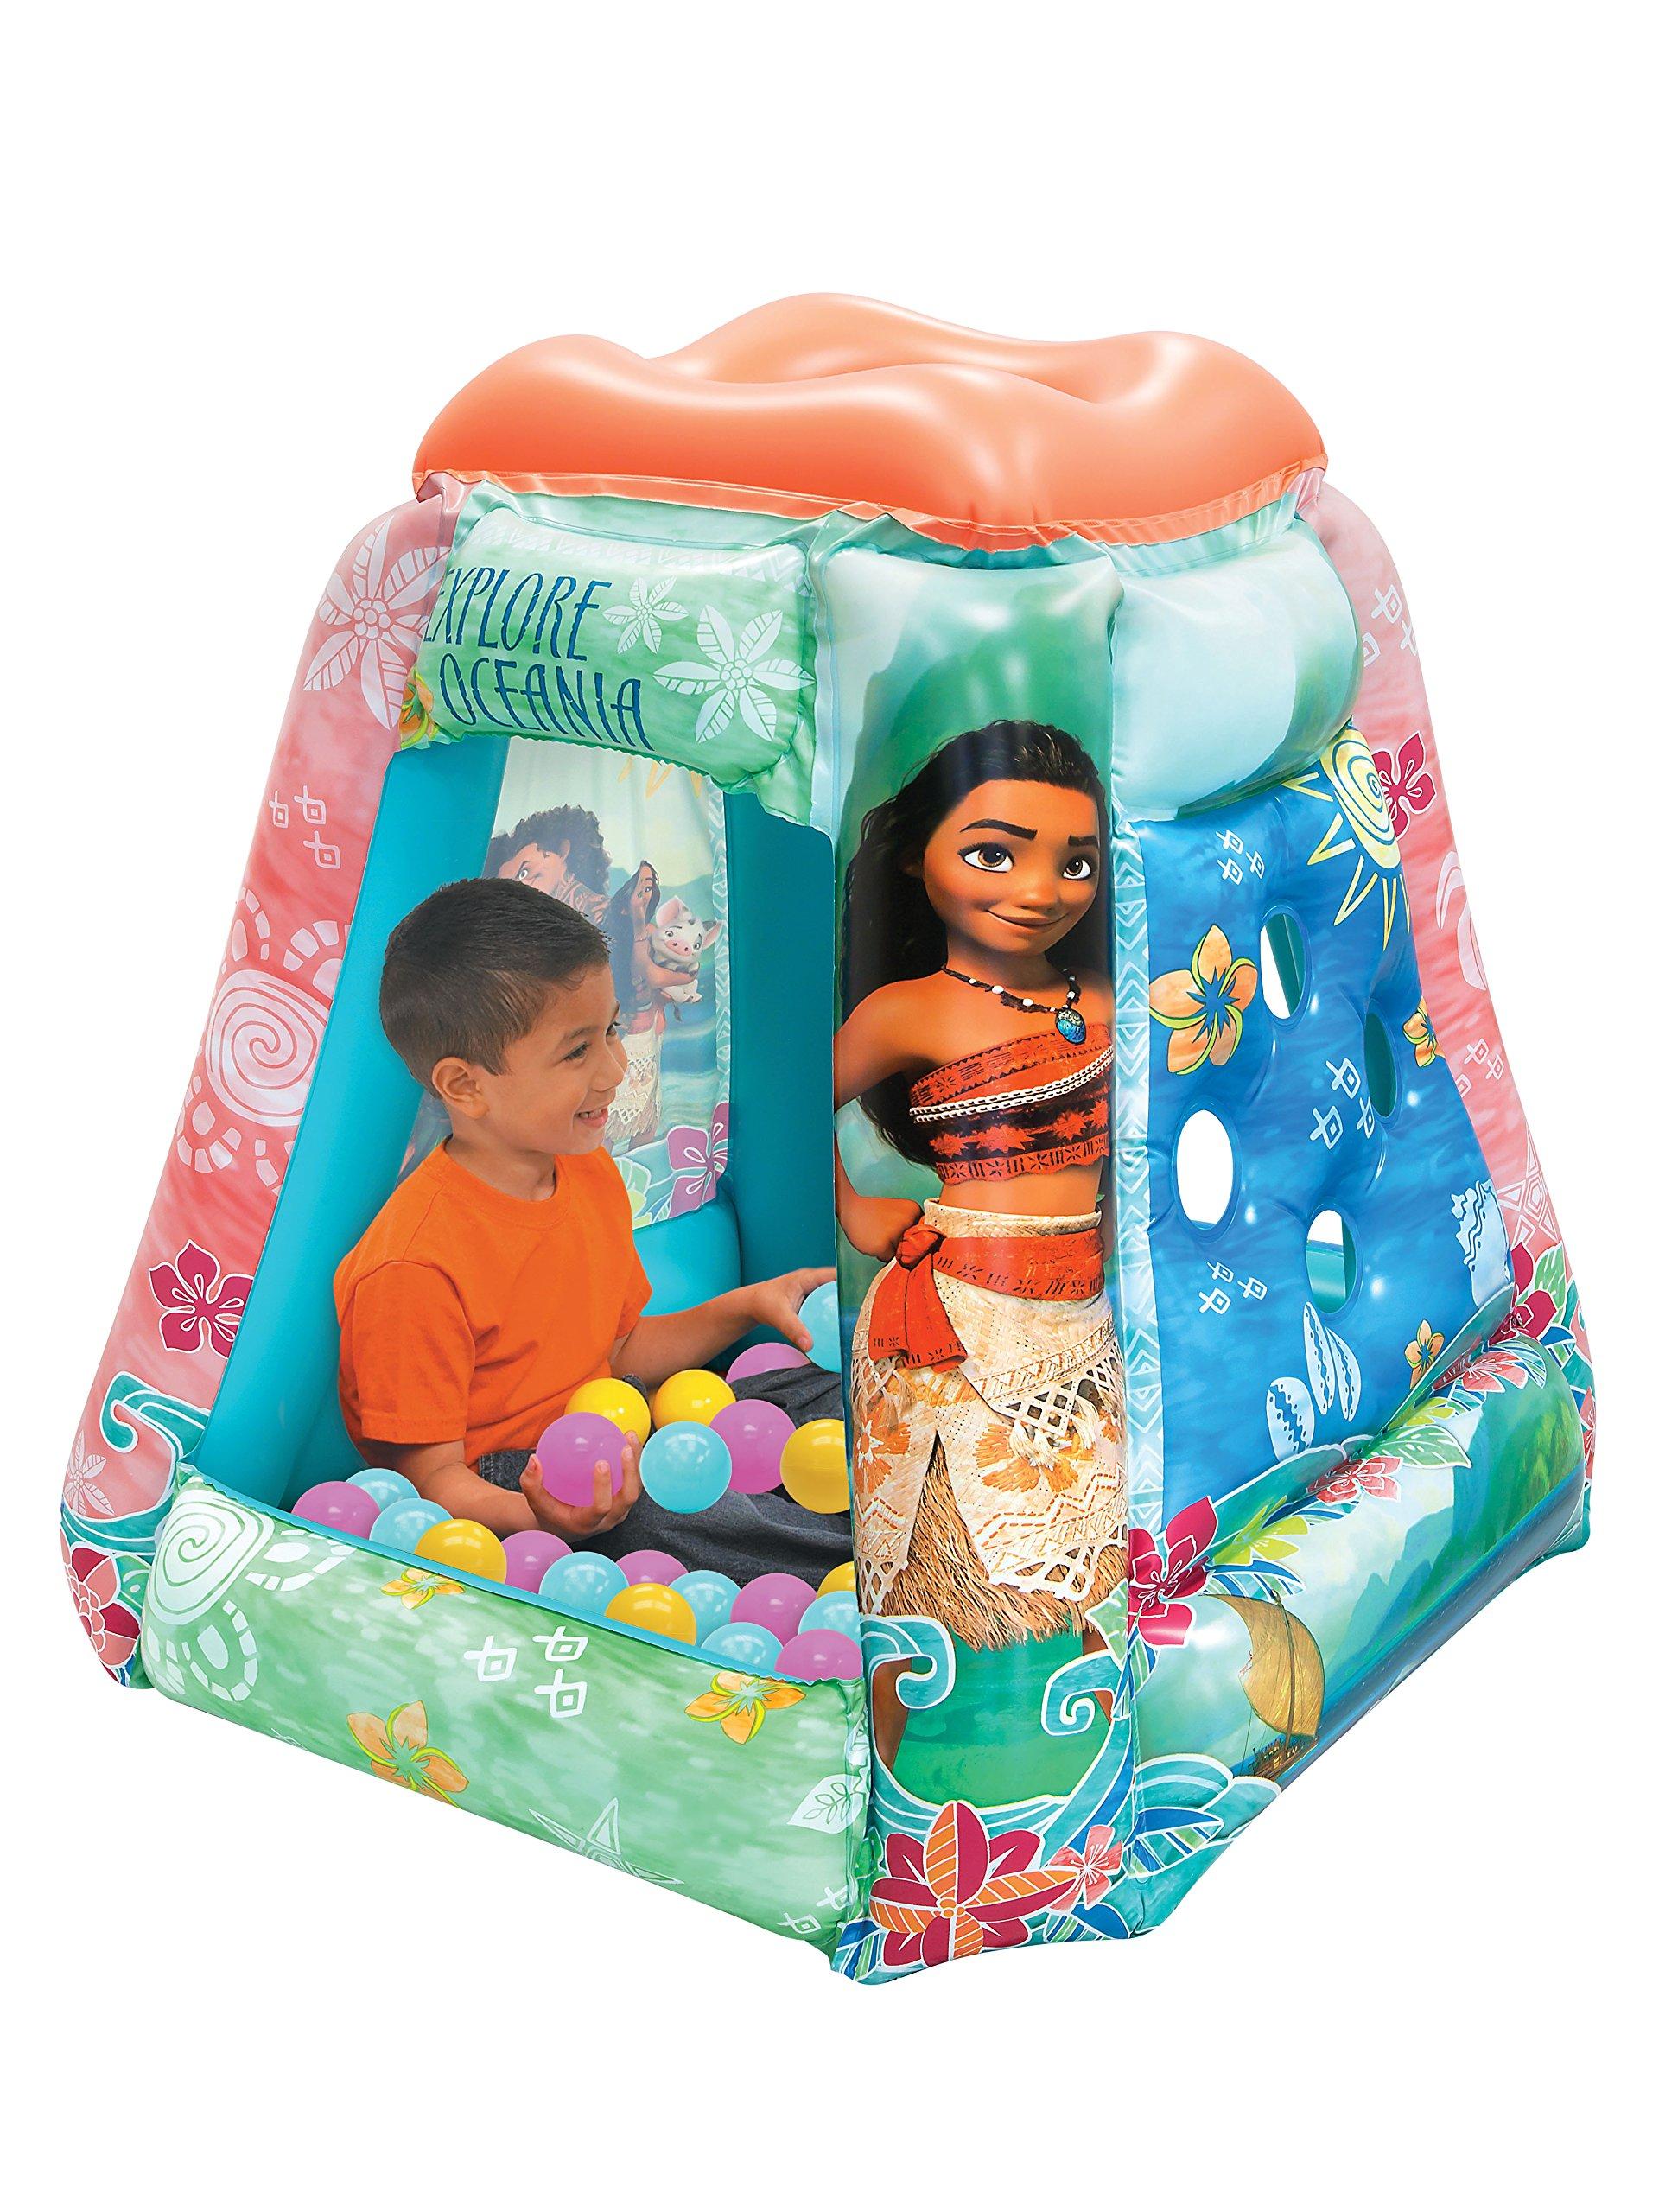 Moana Ball Pit, 1 Inflatable & 20 Sof-Flex Balls, Aqua/Pink, 37''W x 37''D x 34''H